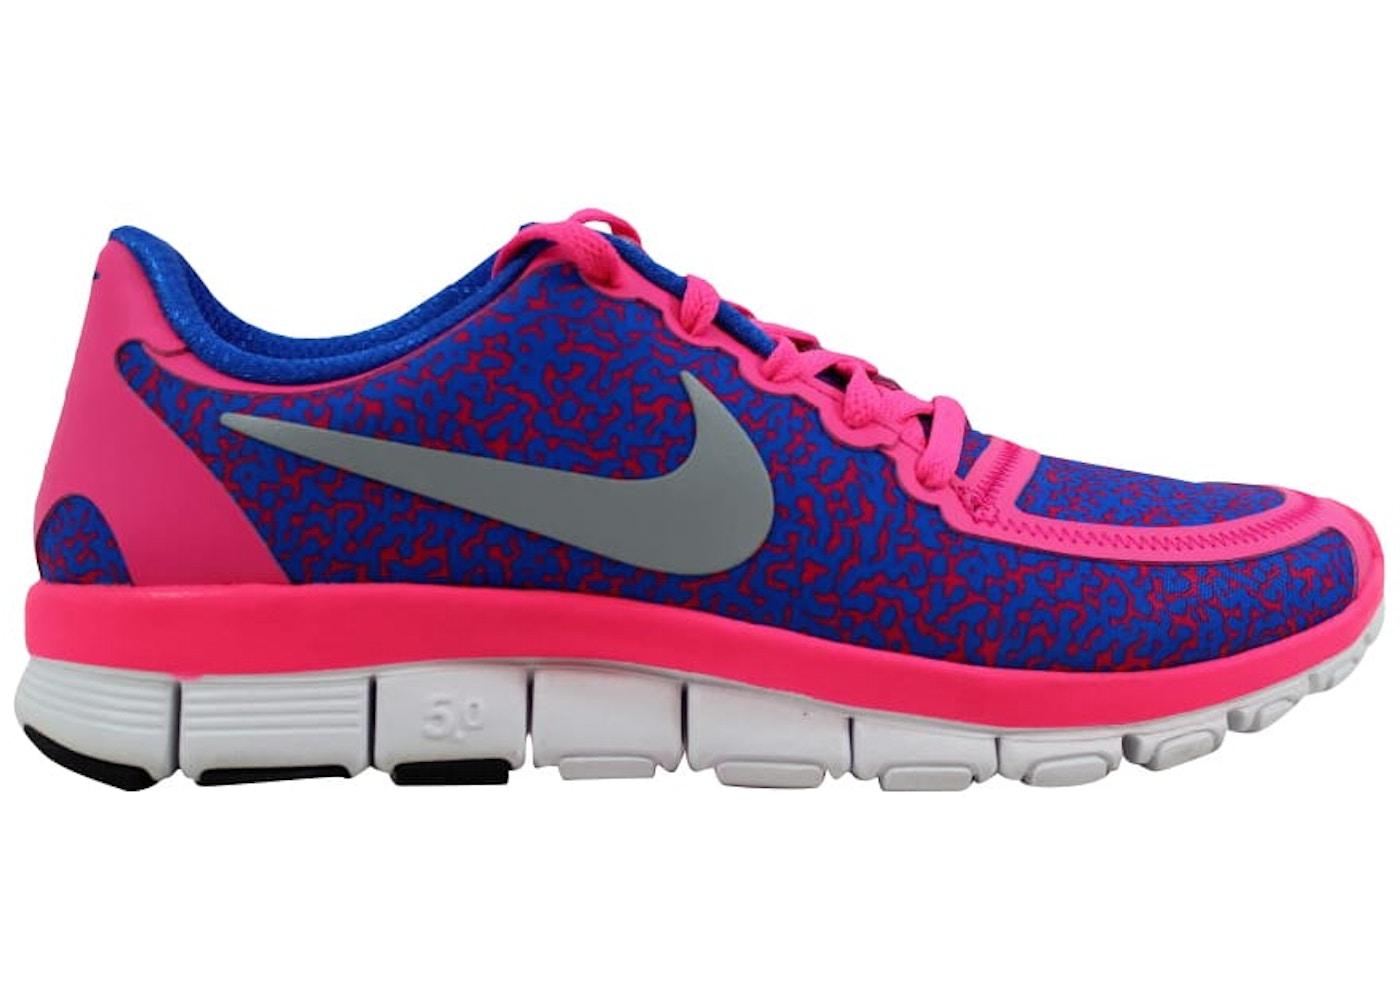 hot sales a965e 0ea4f Nike Free 5.0 V4 Hyper Pink Metallic Platinum-Hyper Cobalt (W ...